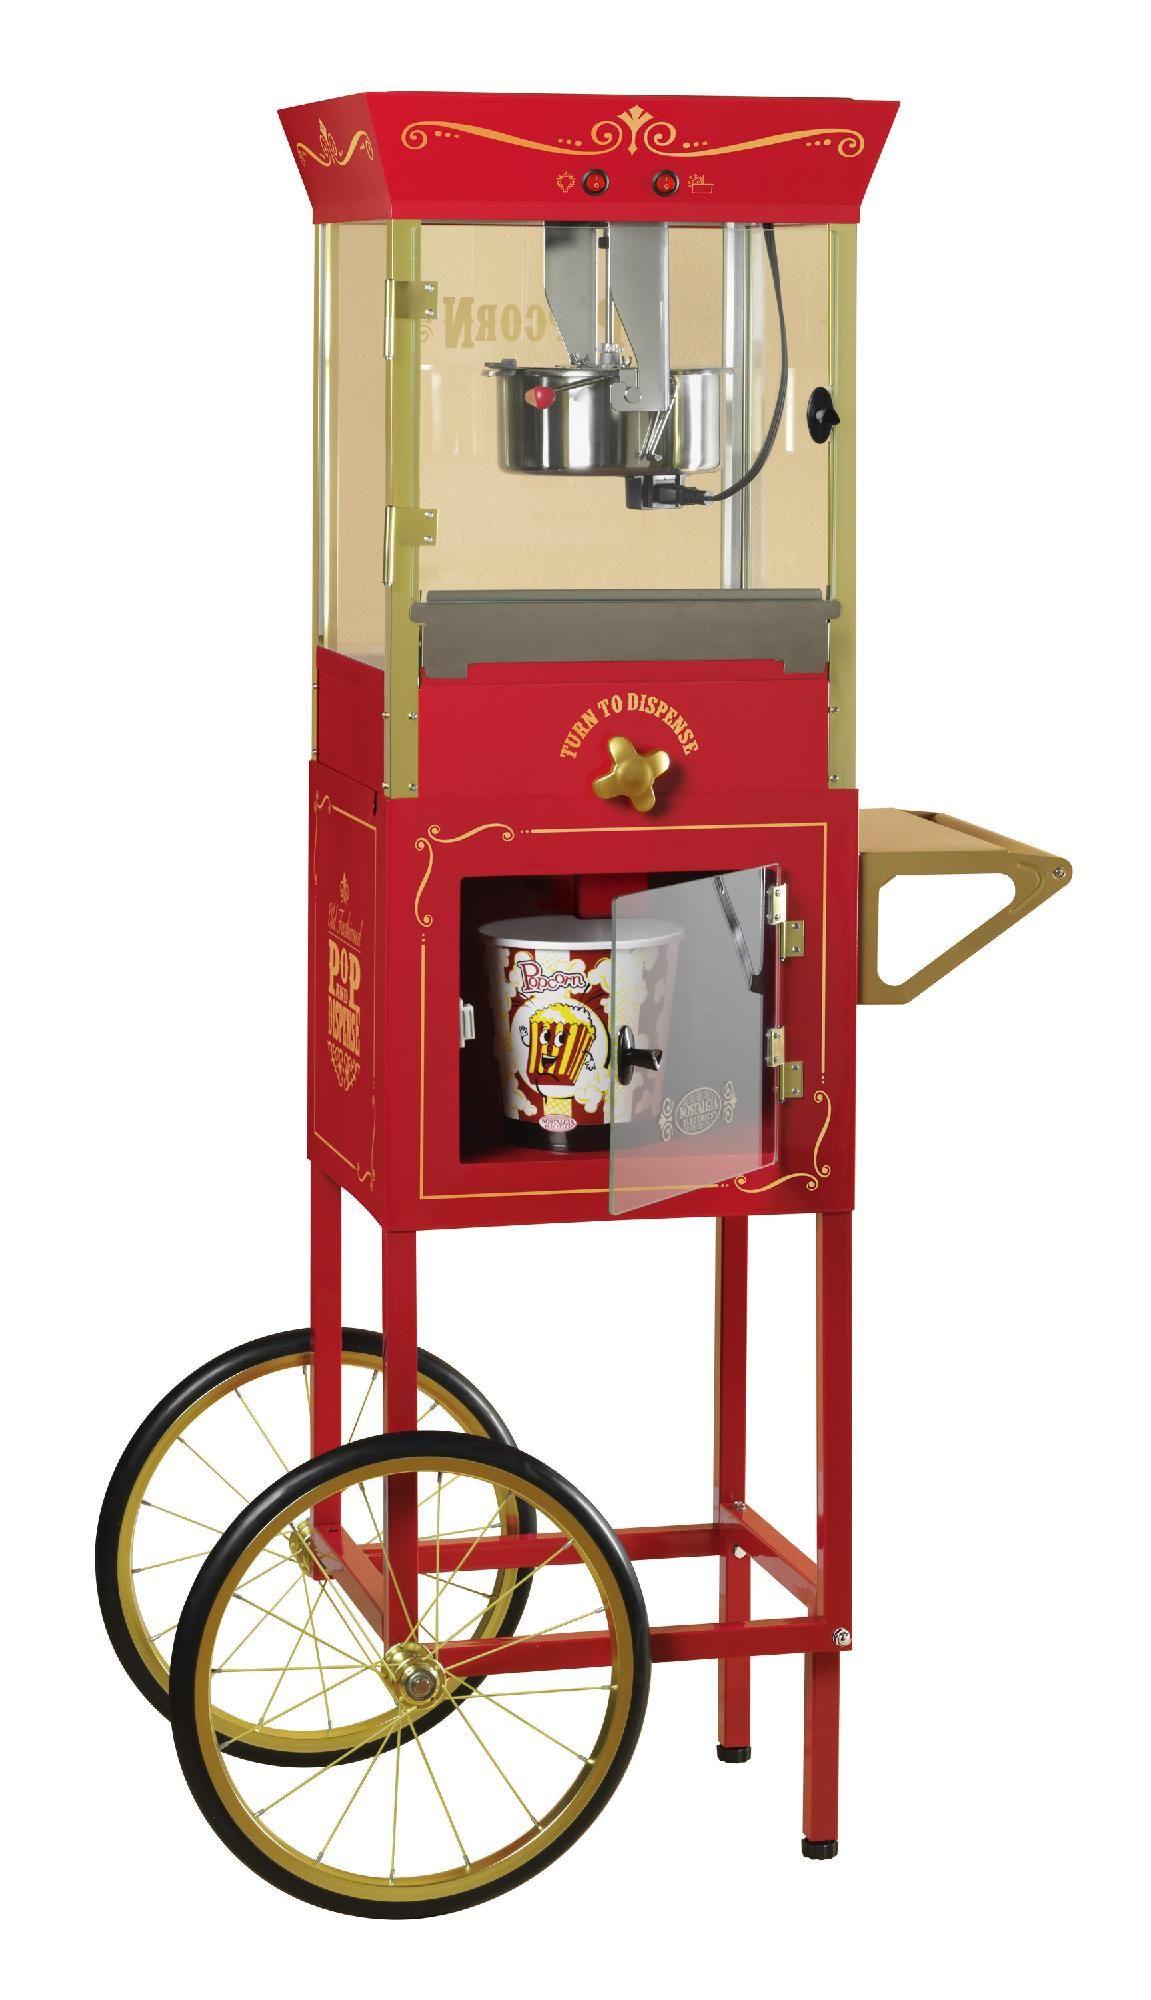 Nostalgia Electrics CCP810 Vintage Collection Popcorn Dispensing Cart, Red